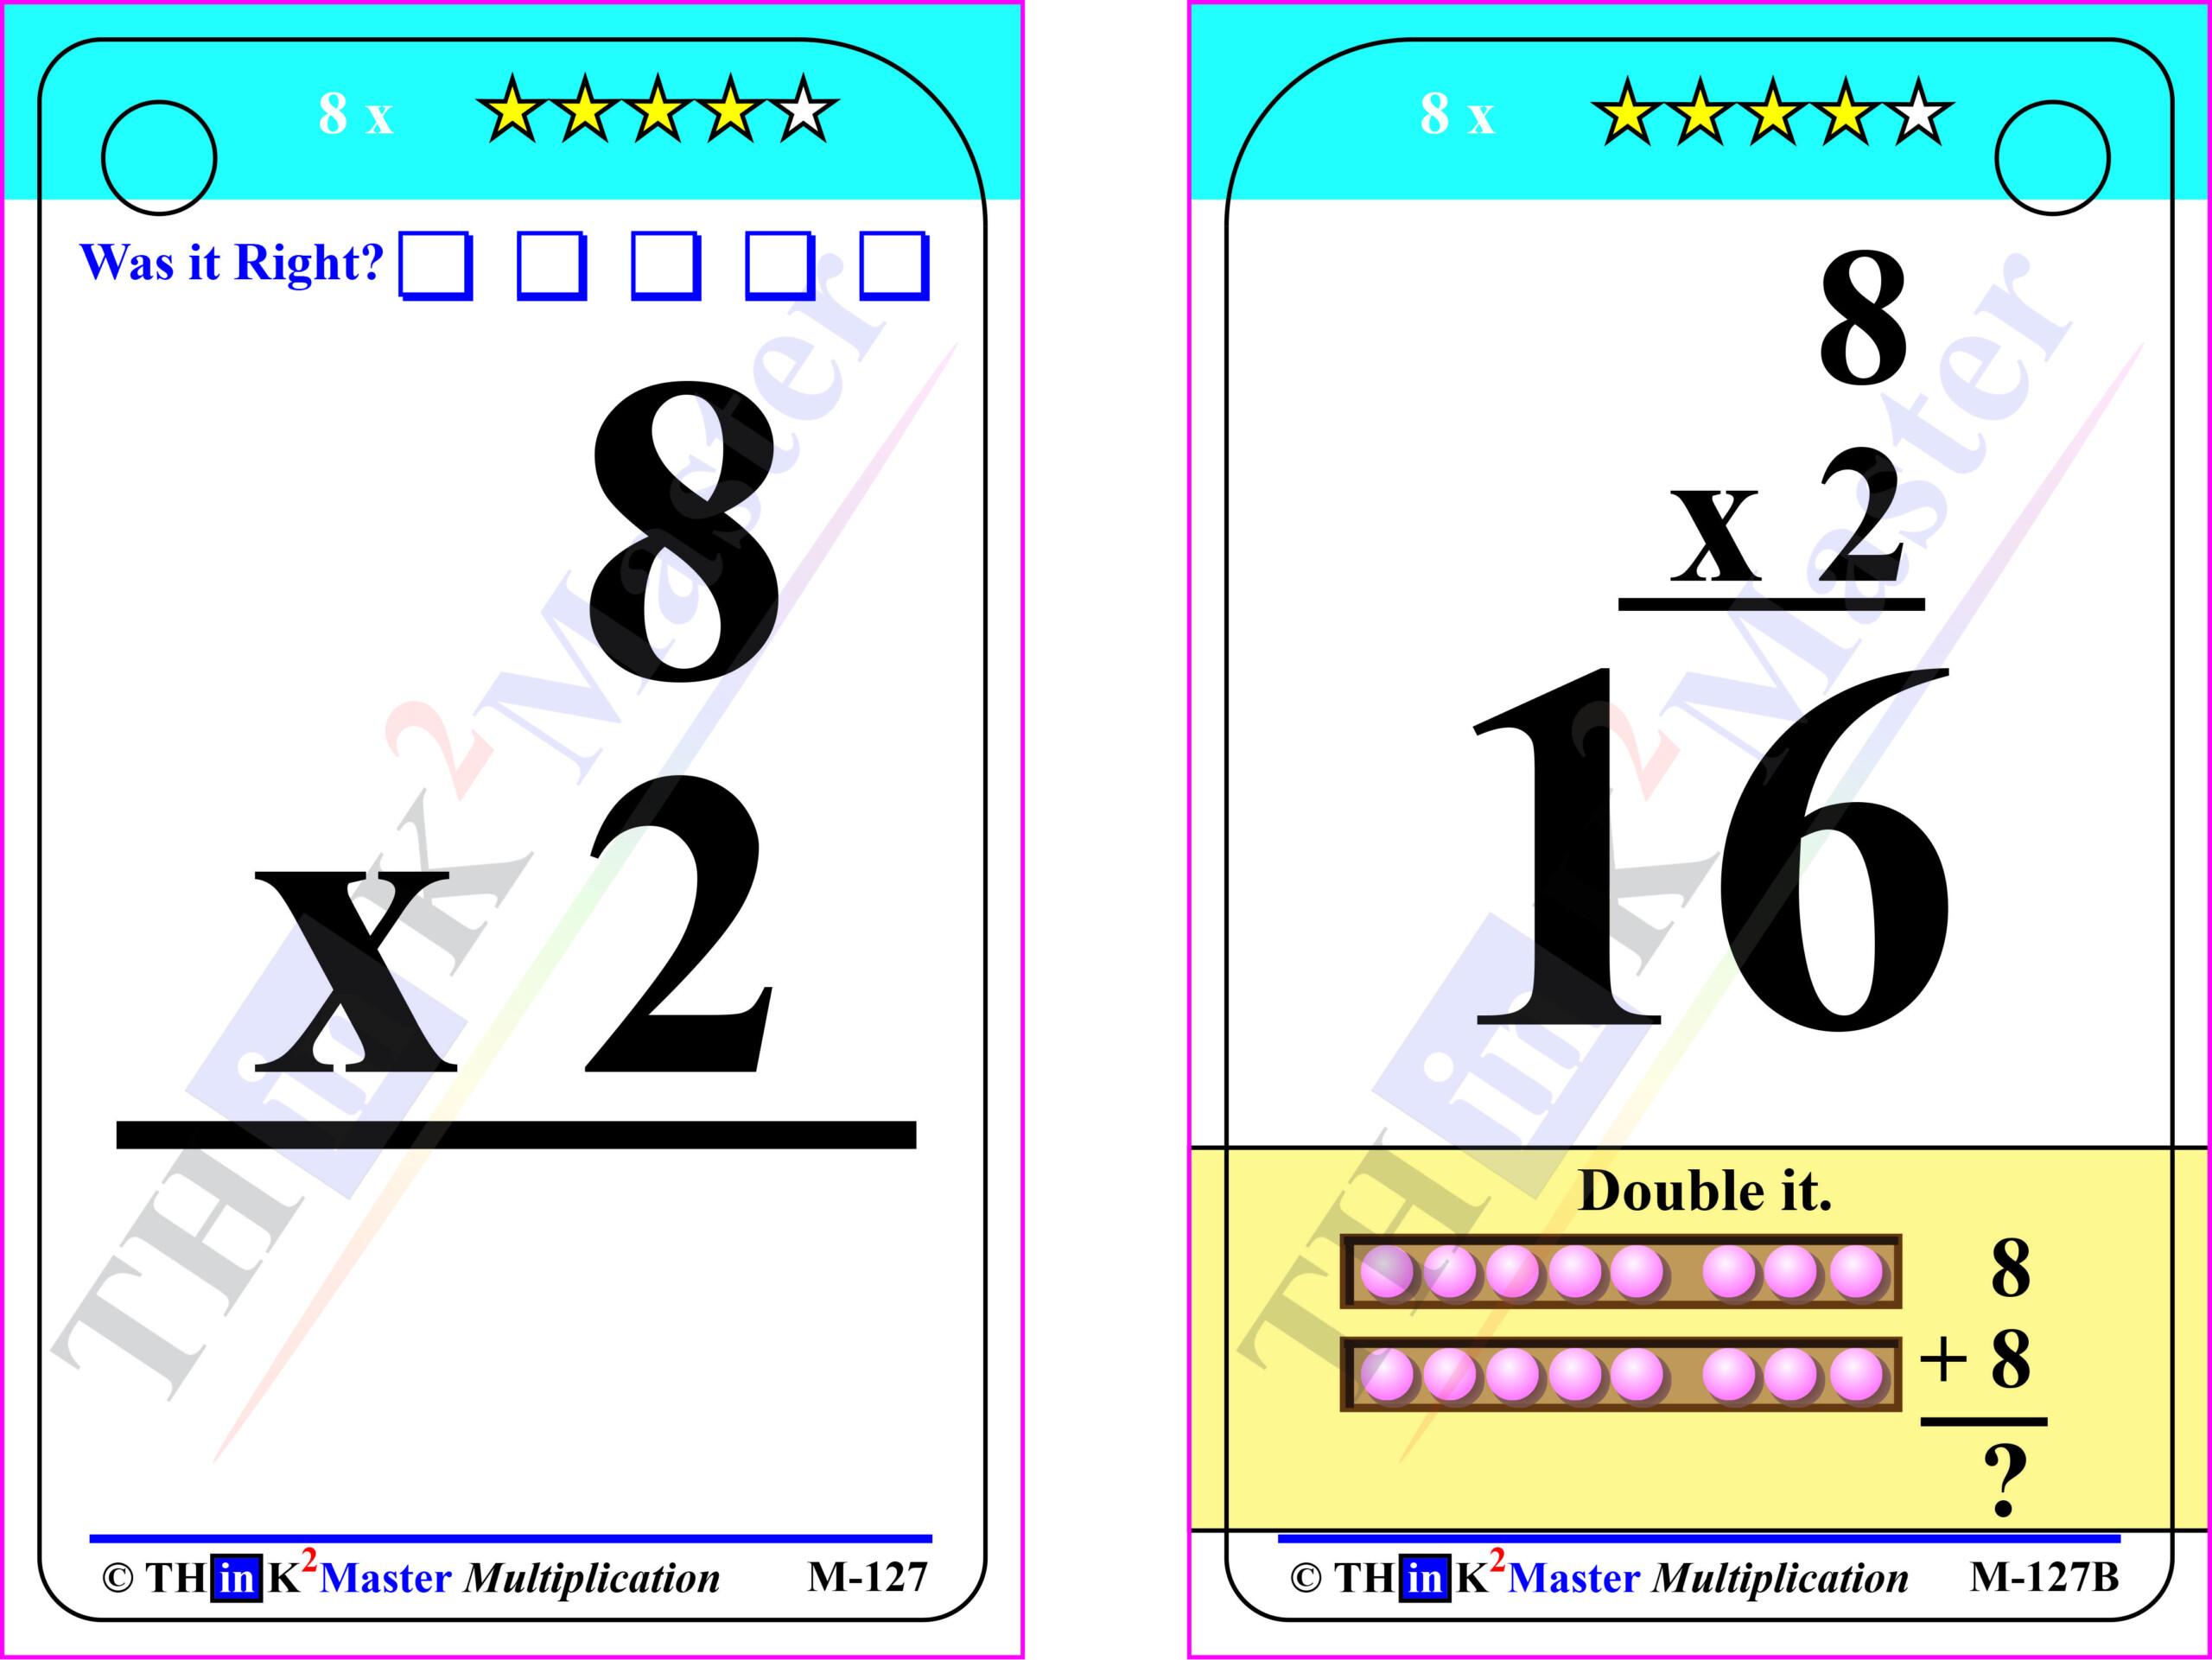 Pin On Free Printable Multiplication Flash Cards throughout Printable Multiplication Cards 0-12